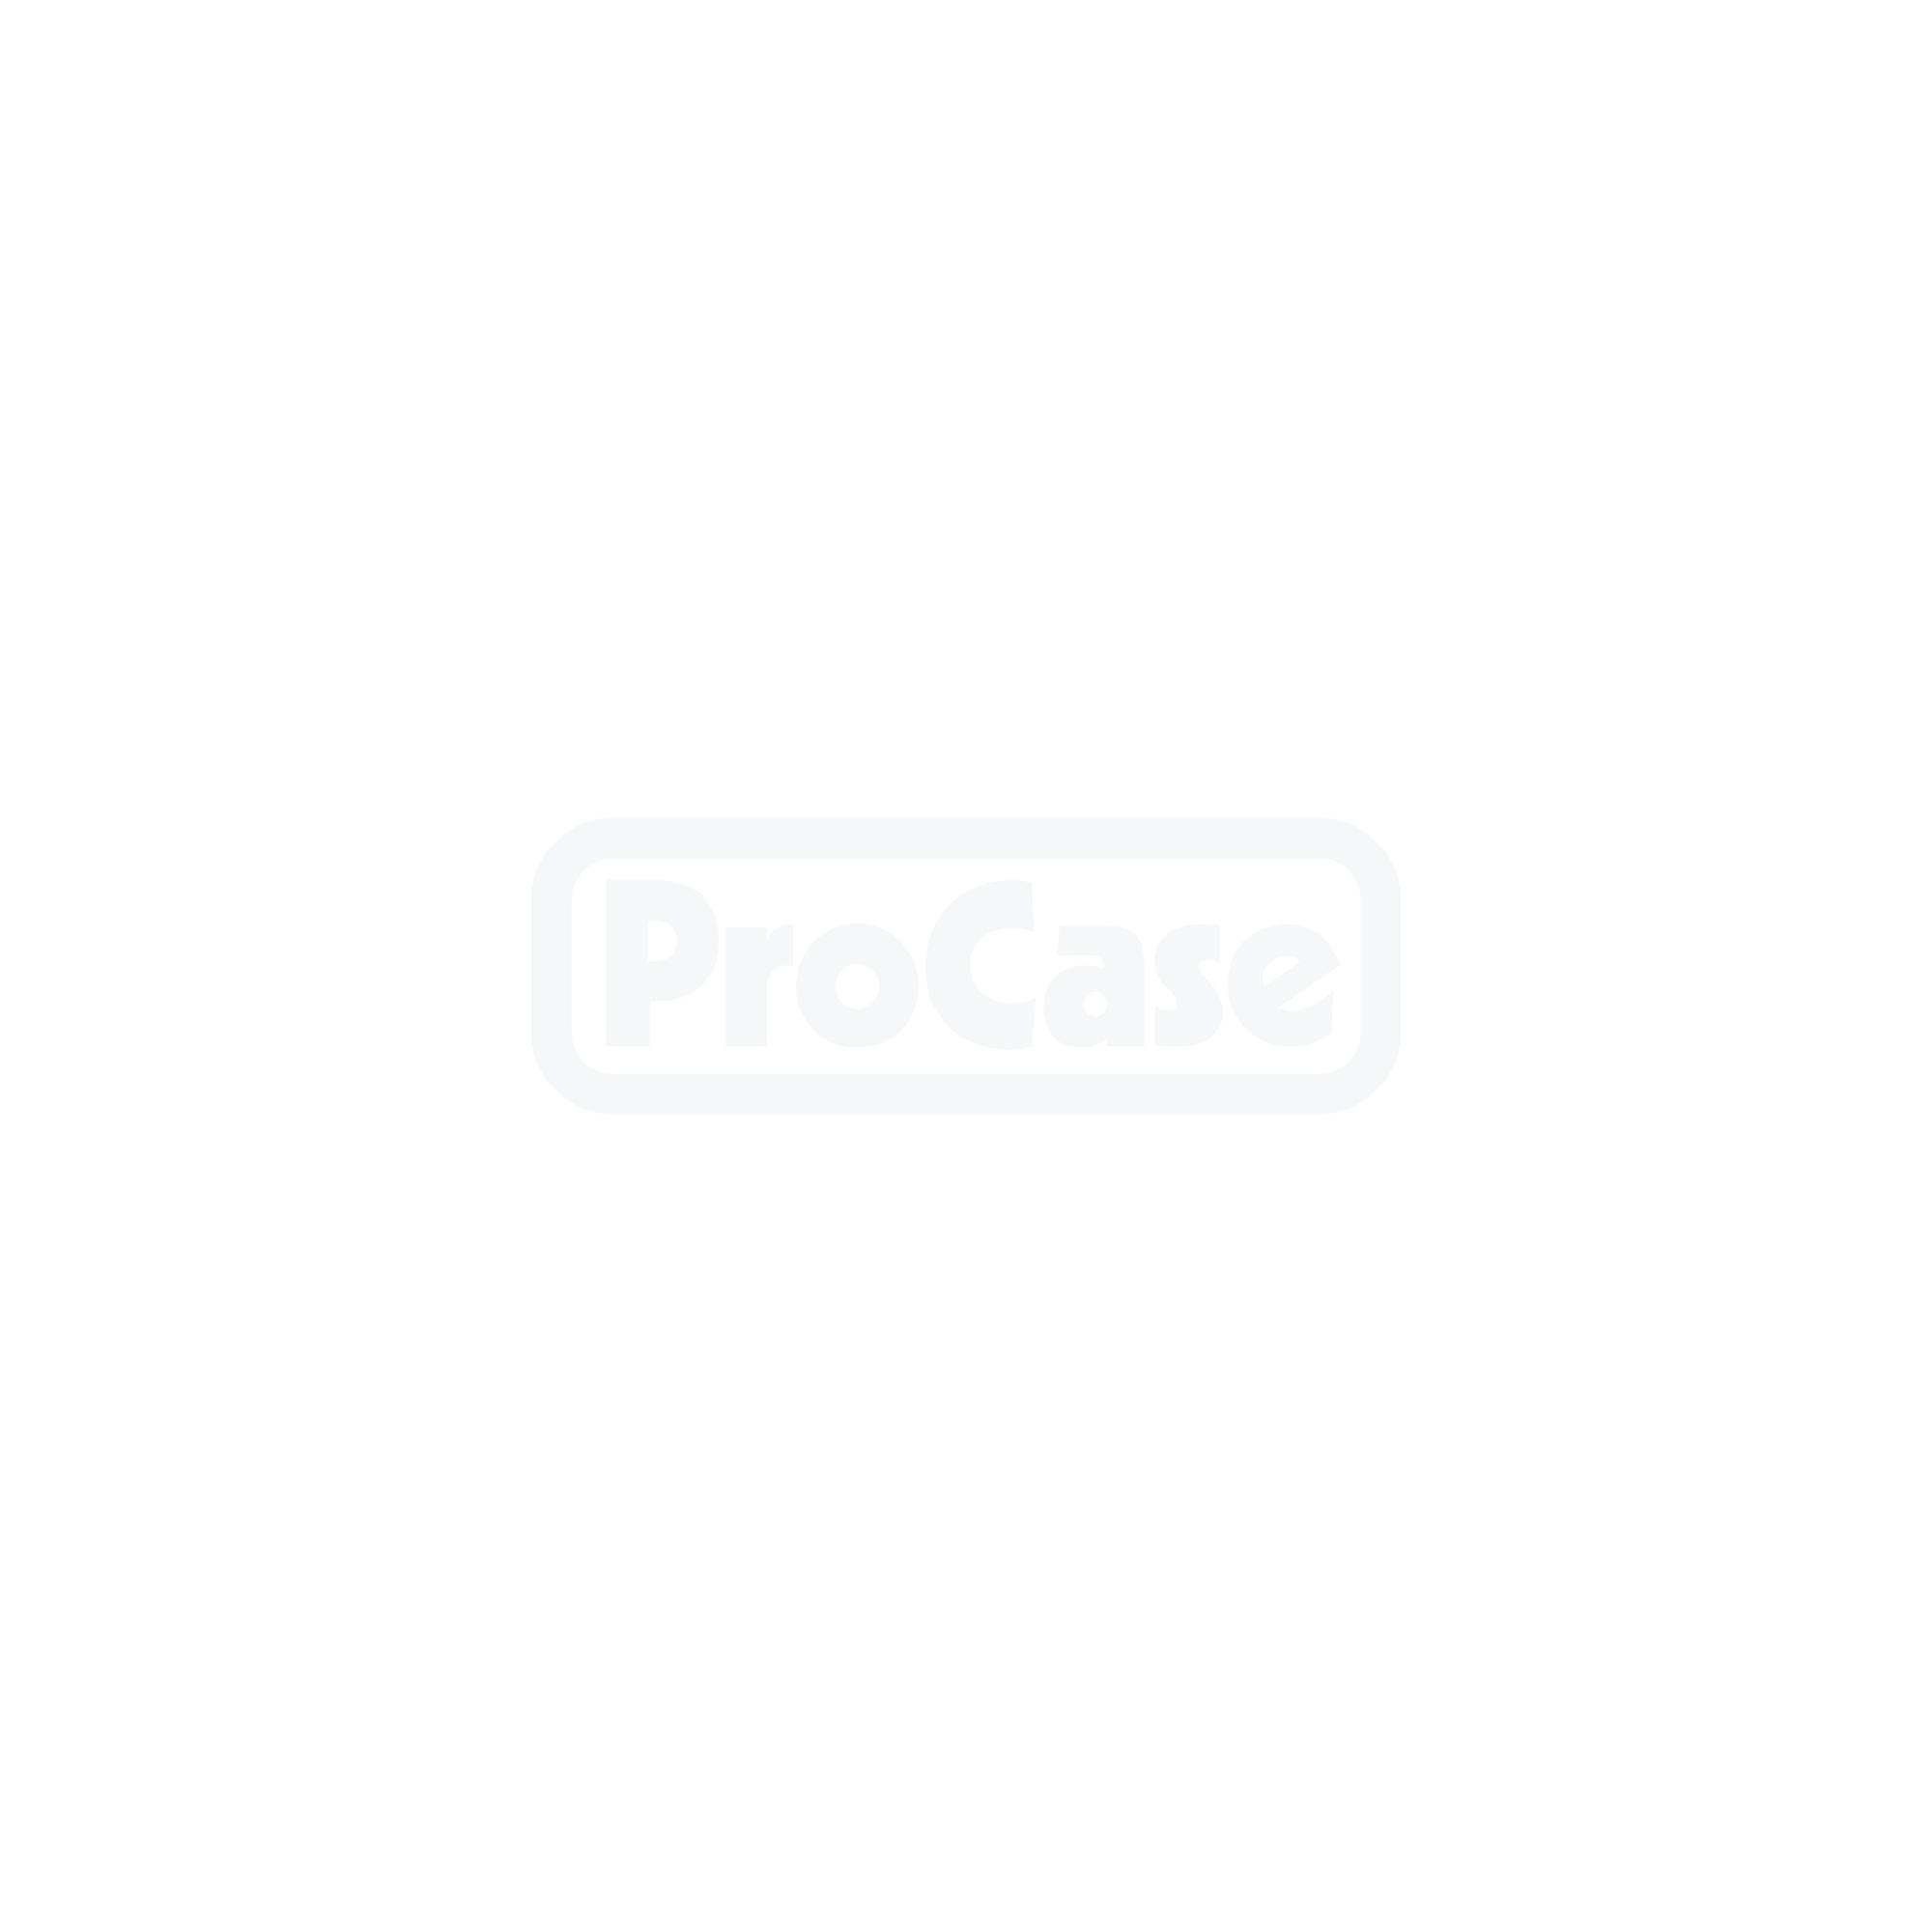 Packcase 3 Transporttruhe schwarz 2